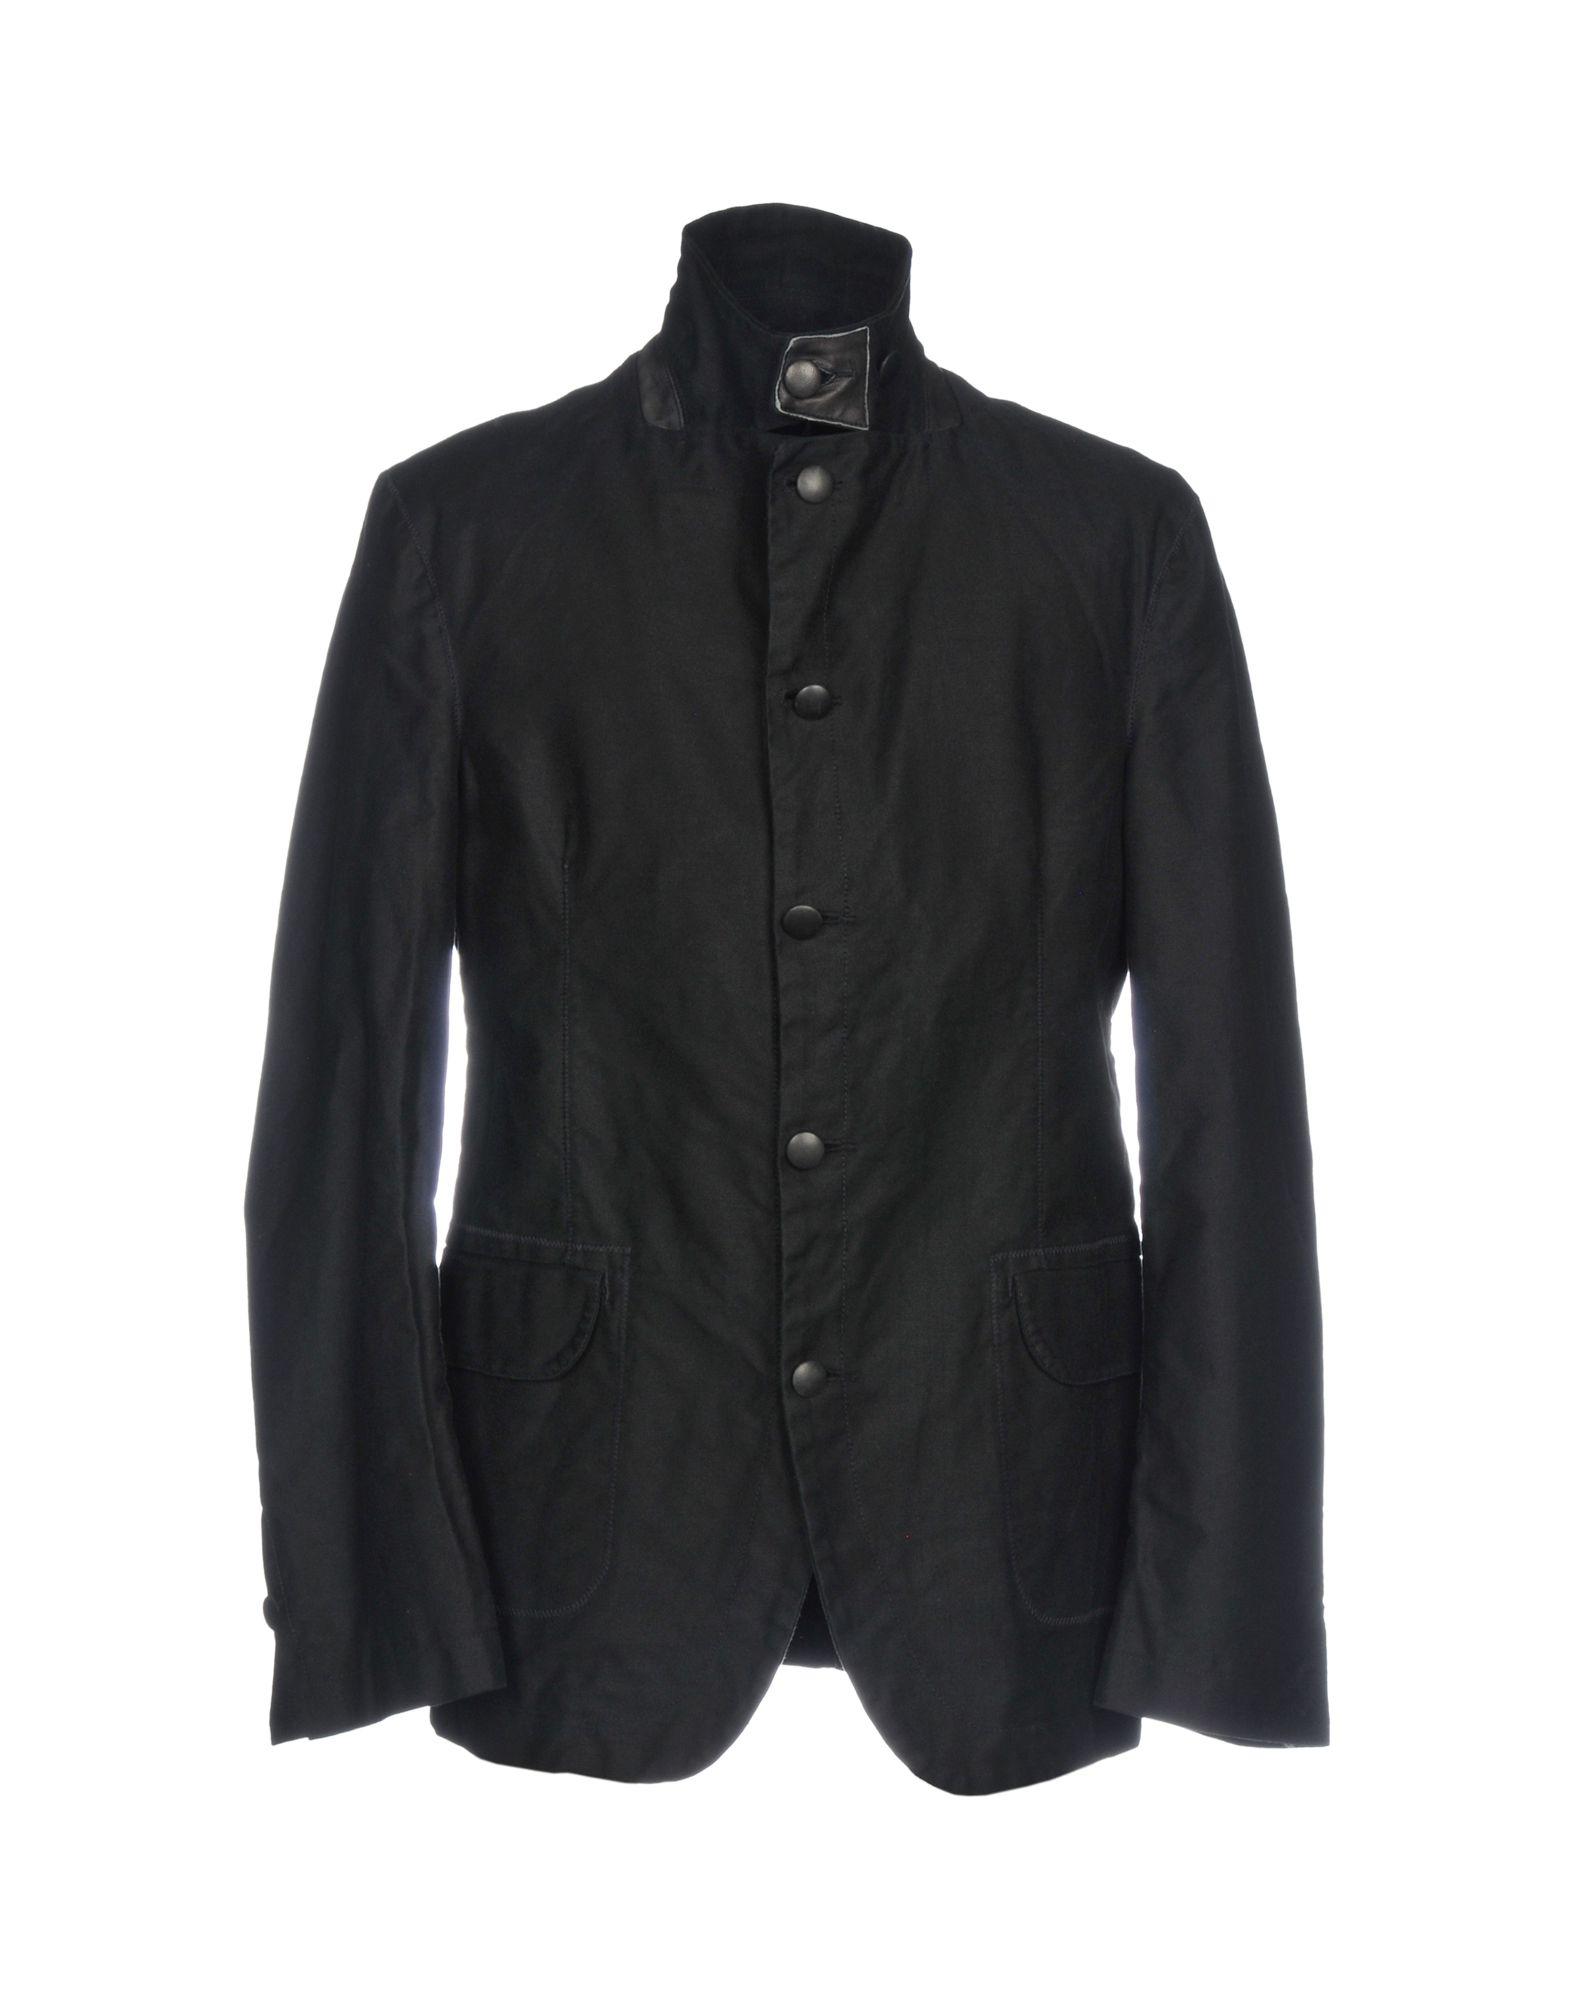 HANNES ROETHER Blazer in Black